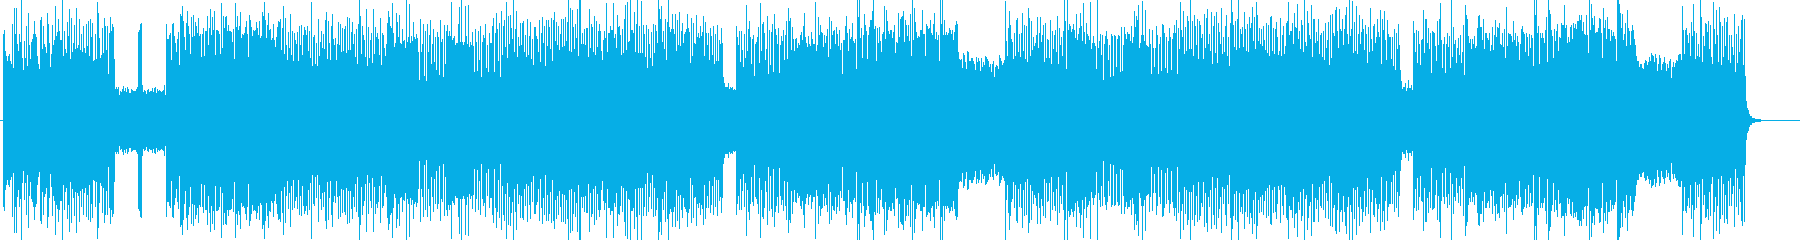 METAL、HARD、POWER 307の再生済みの波形